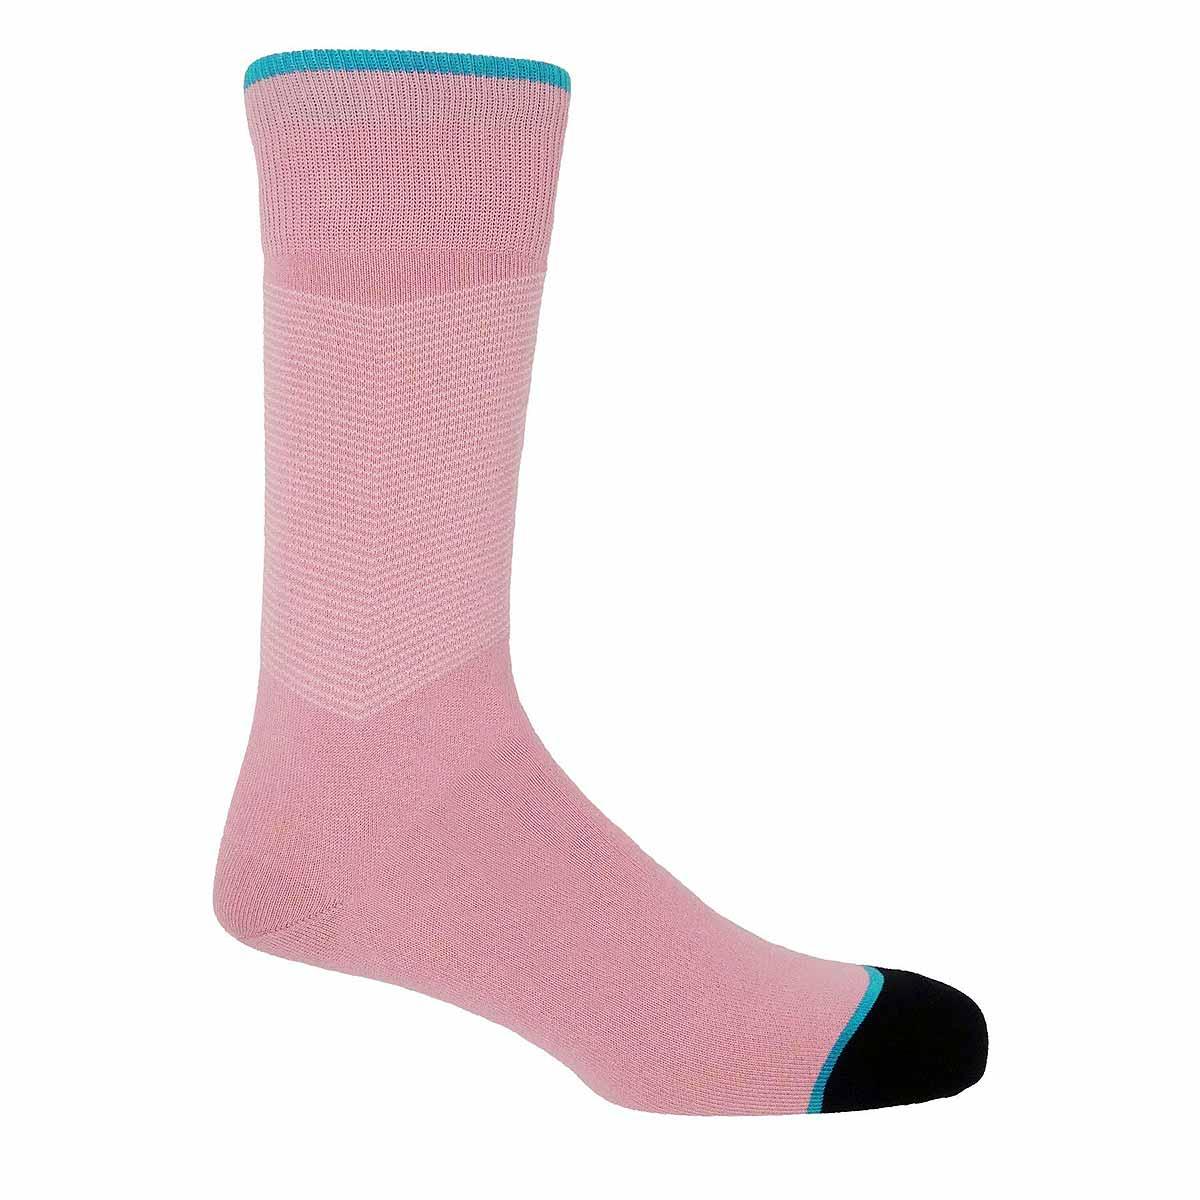 sock on white background